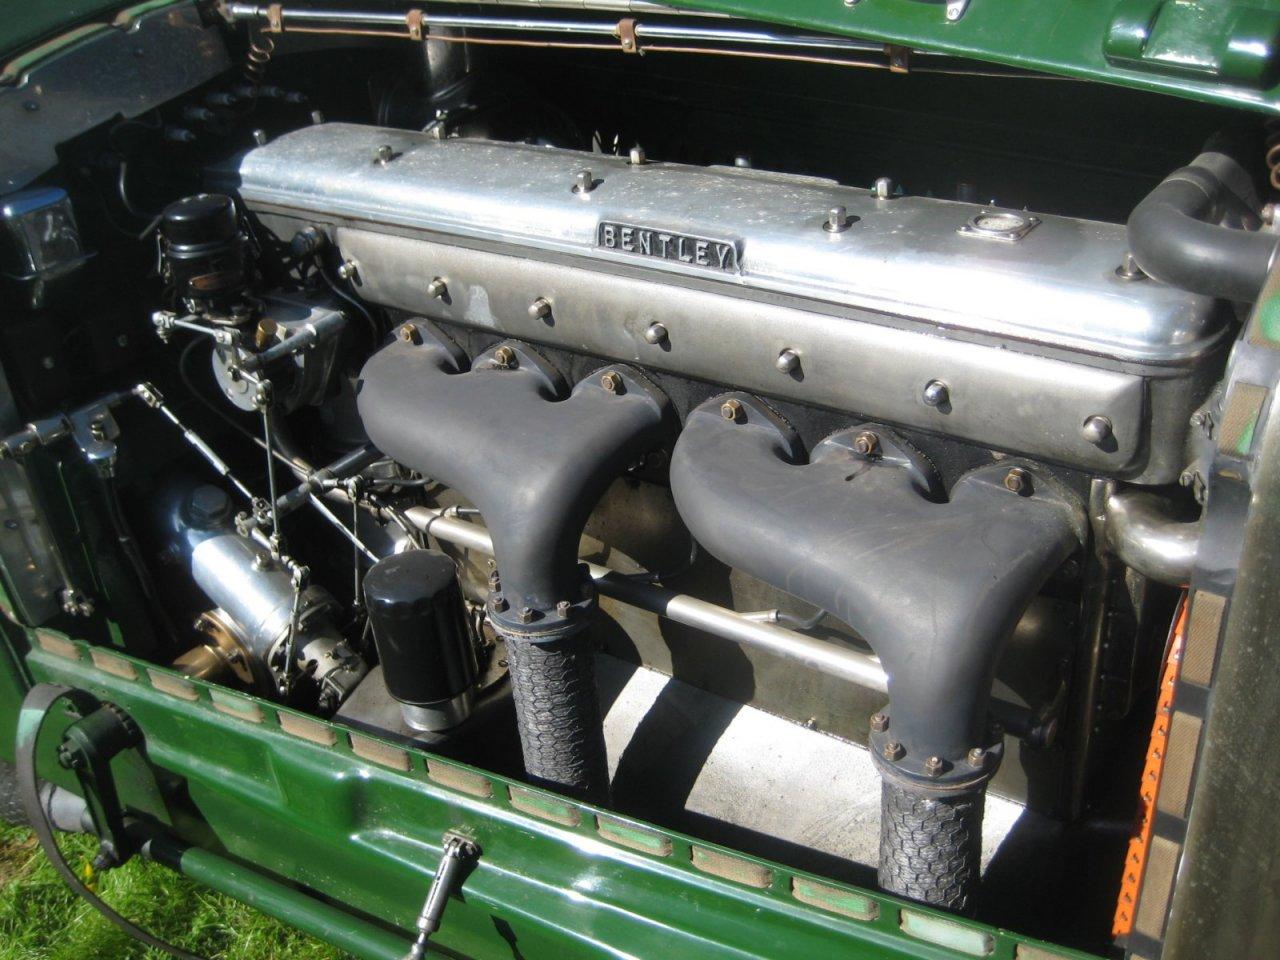 59af0870cfb49_RP17Bentleymoottori.thumb.JPG.49063d3a9e667f2aeb67c9e291b063cb.JPG